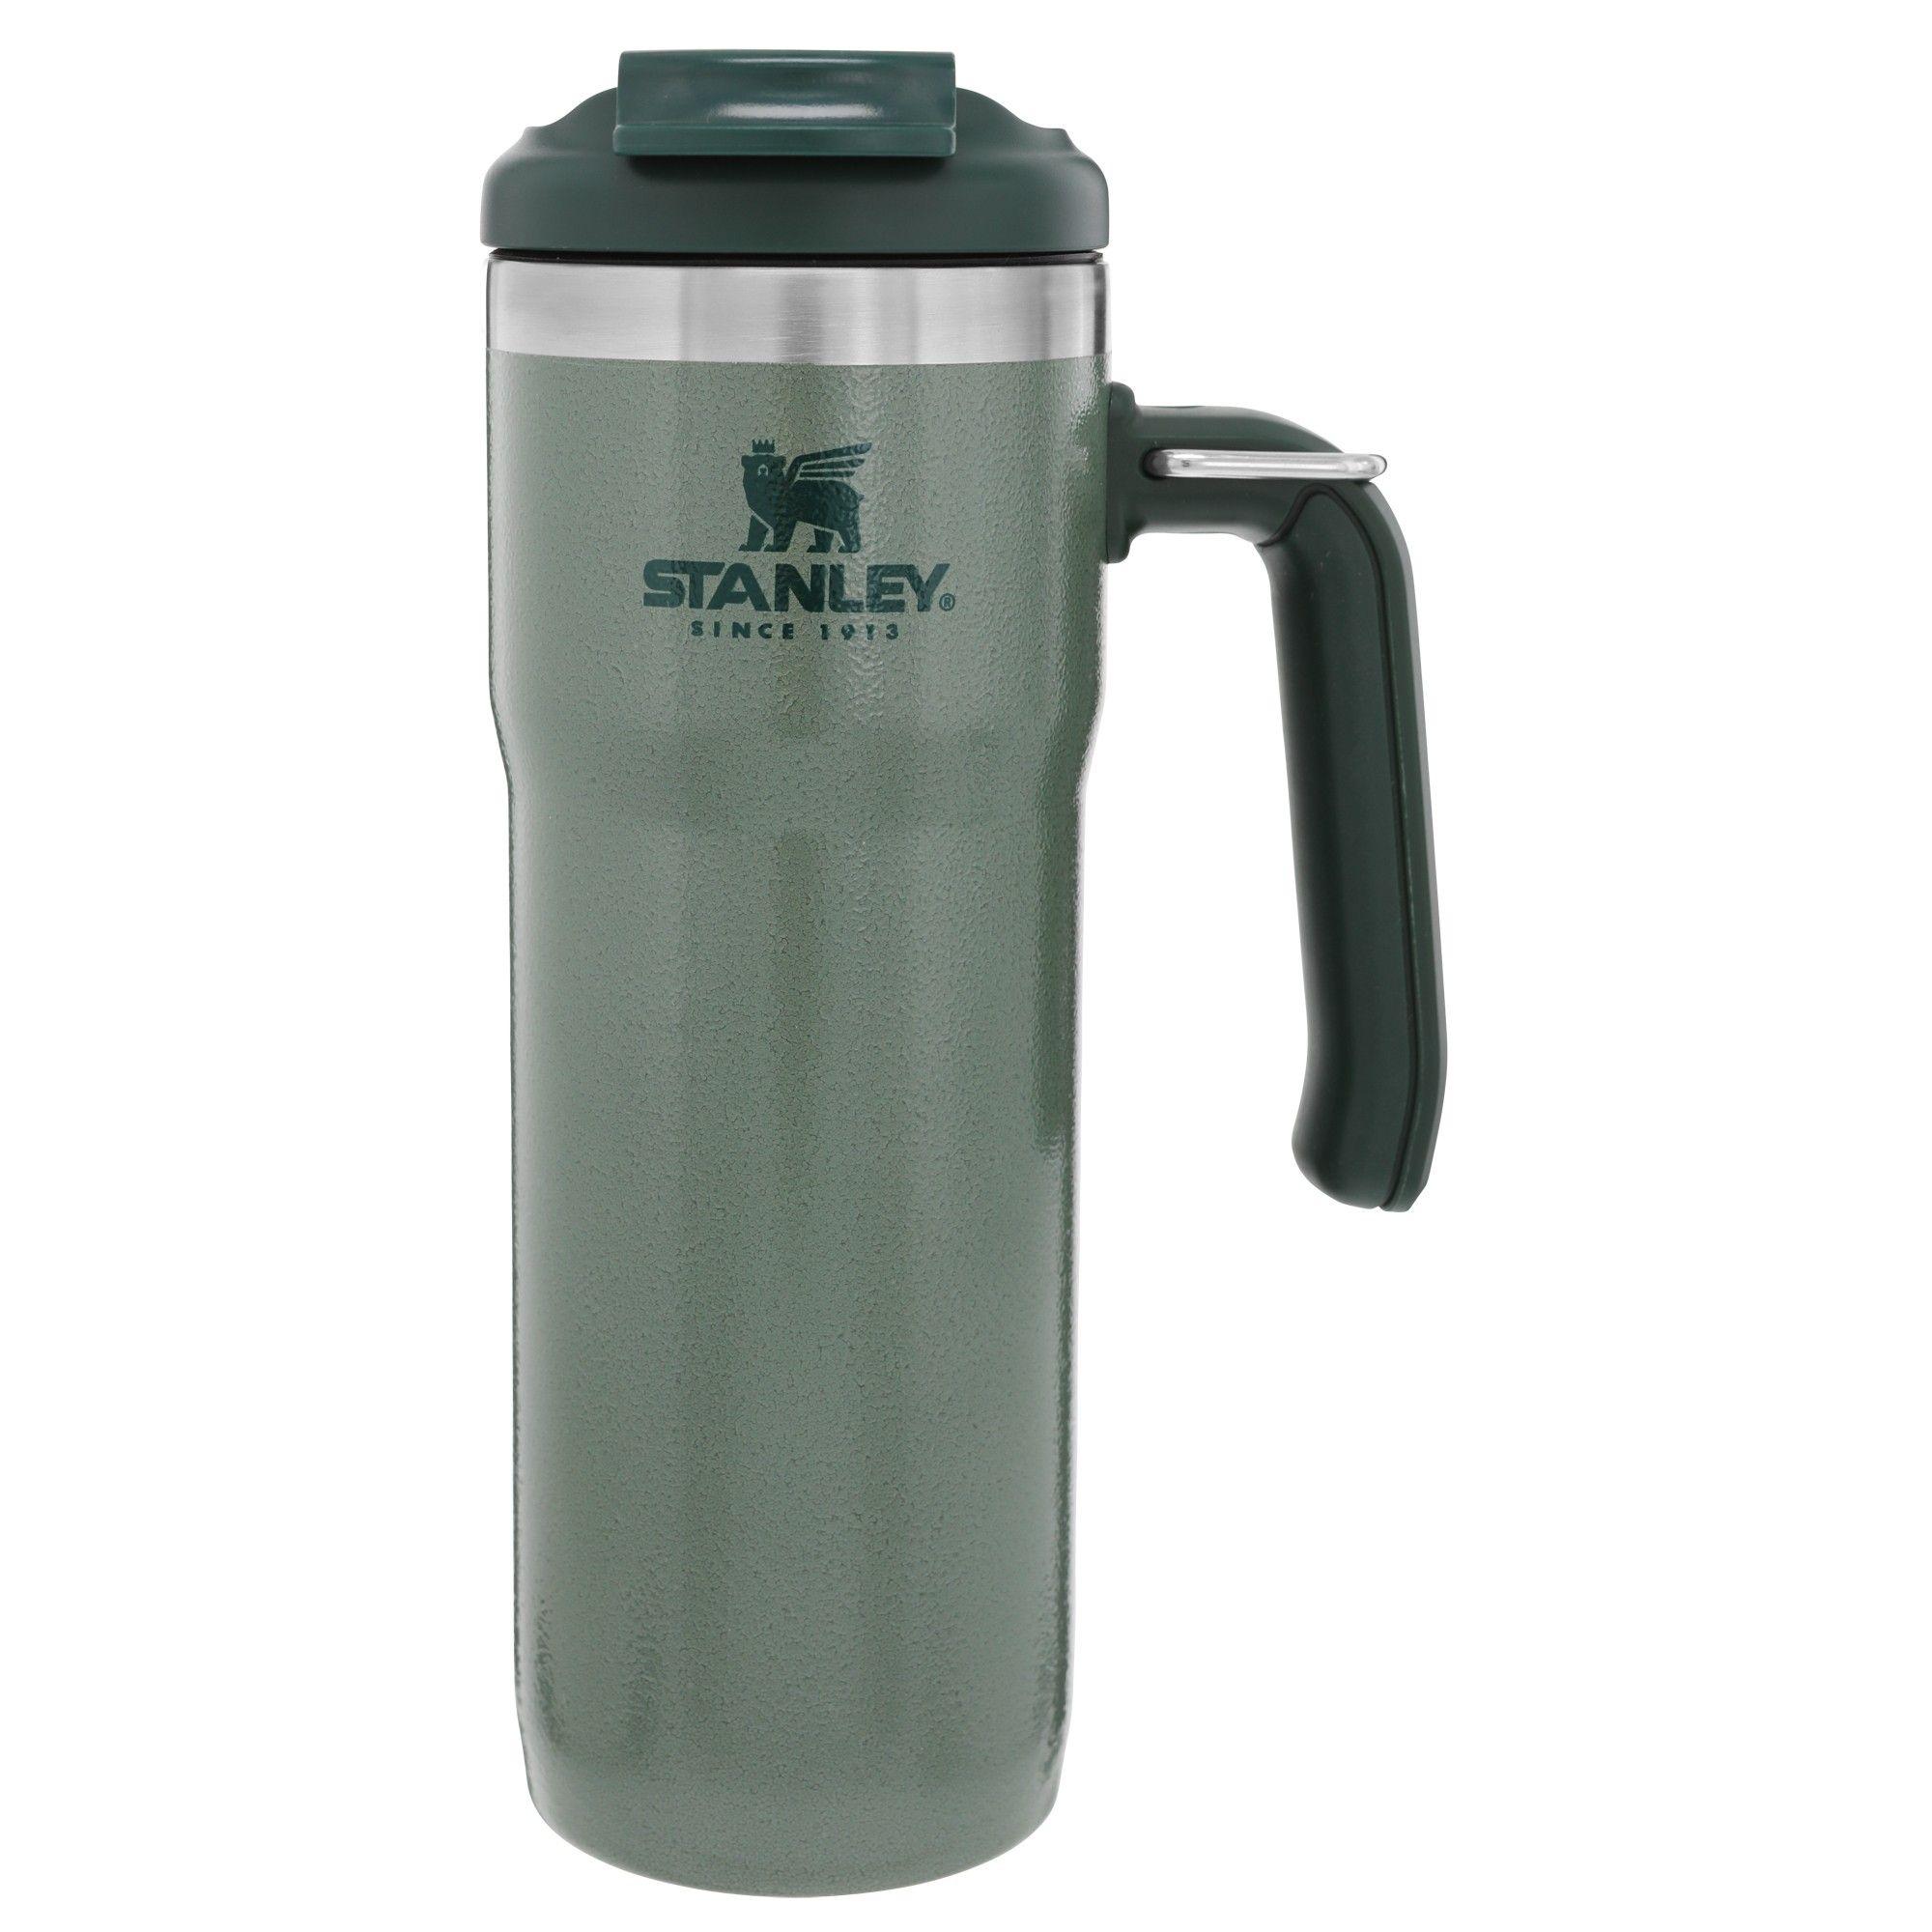 Stanley 20oz Classic TwinLock Travel Mug Green, Adult